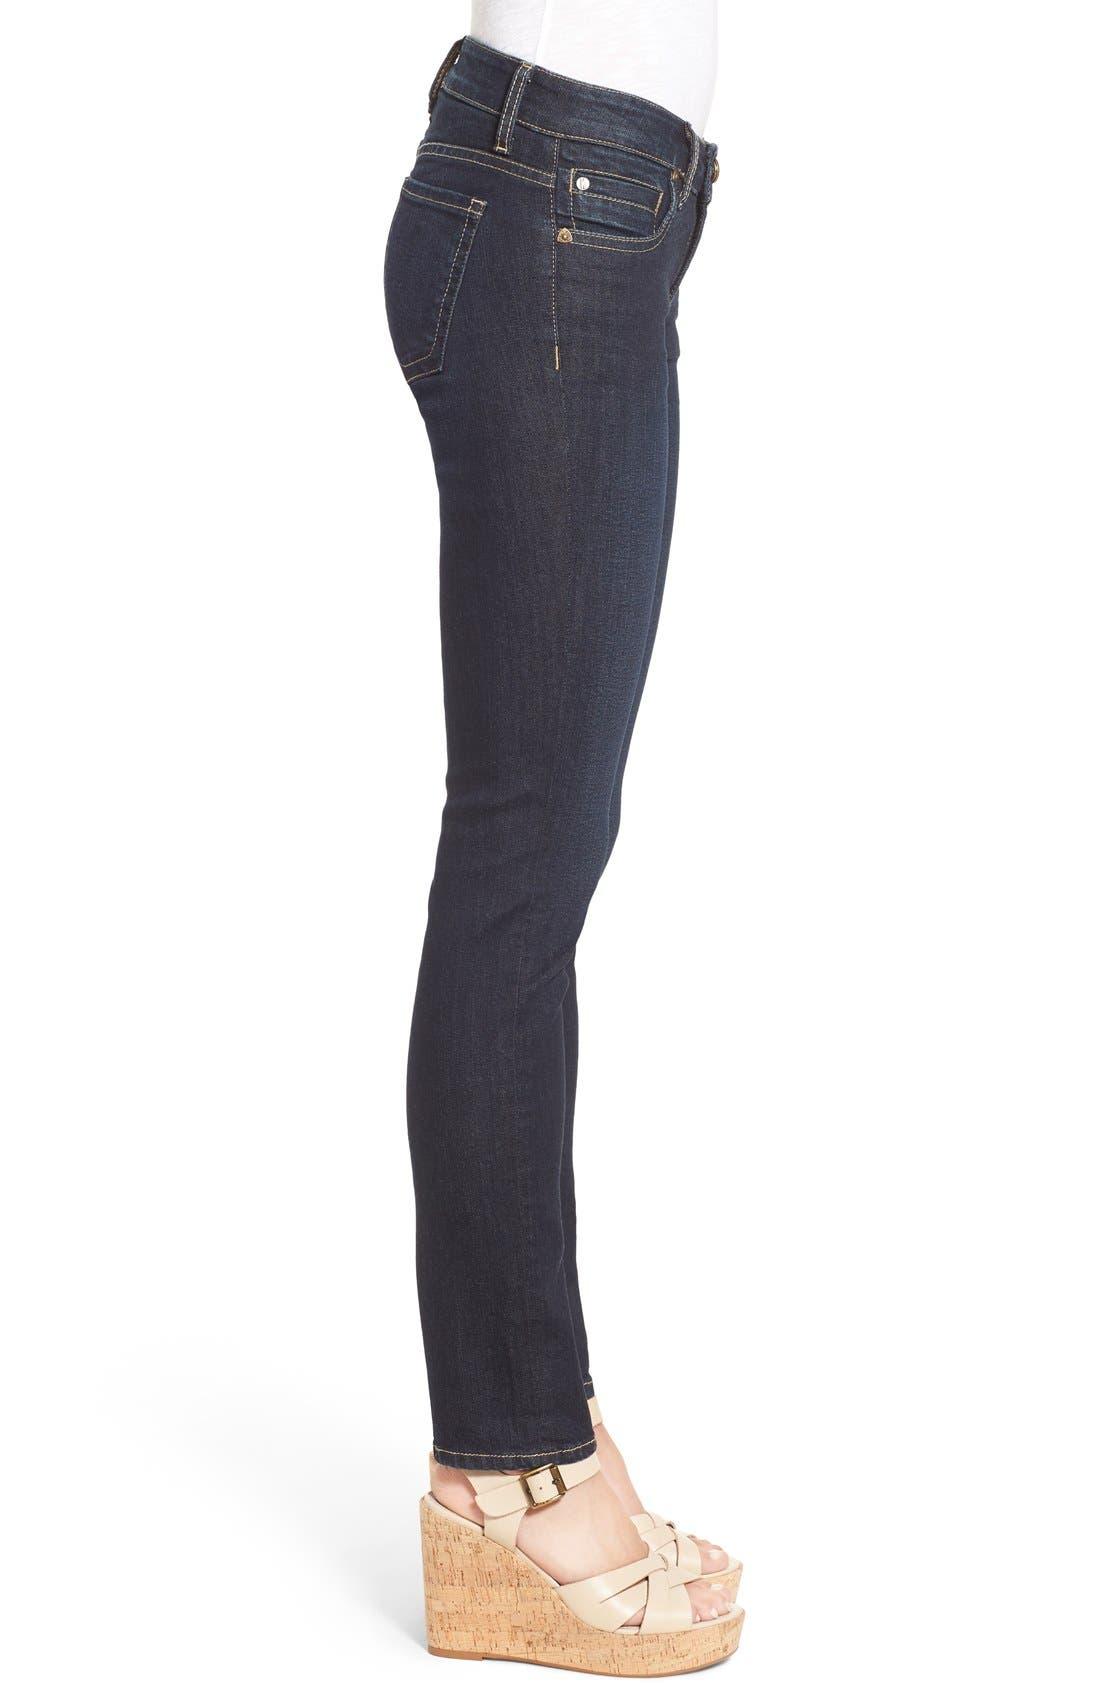 Alternate Image 3  - KUT from the Kloth 'Catherine' Slim Boyfriend Jeans (Limitless) (Petite)